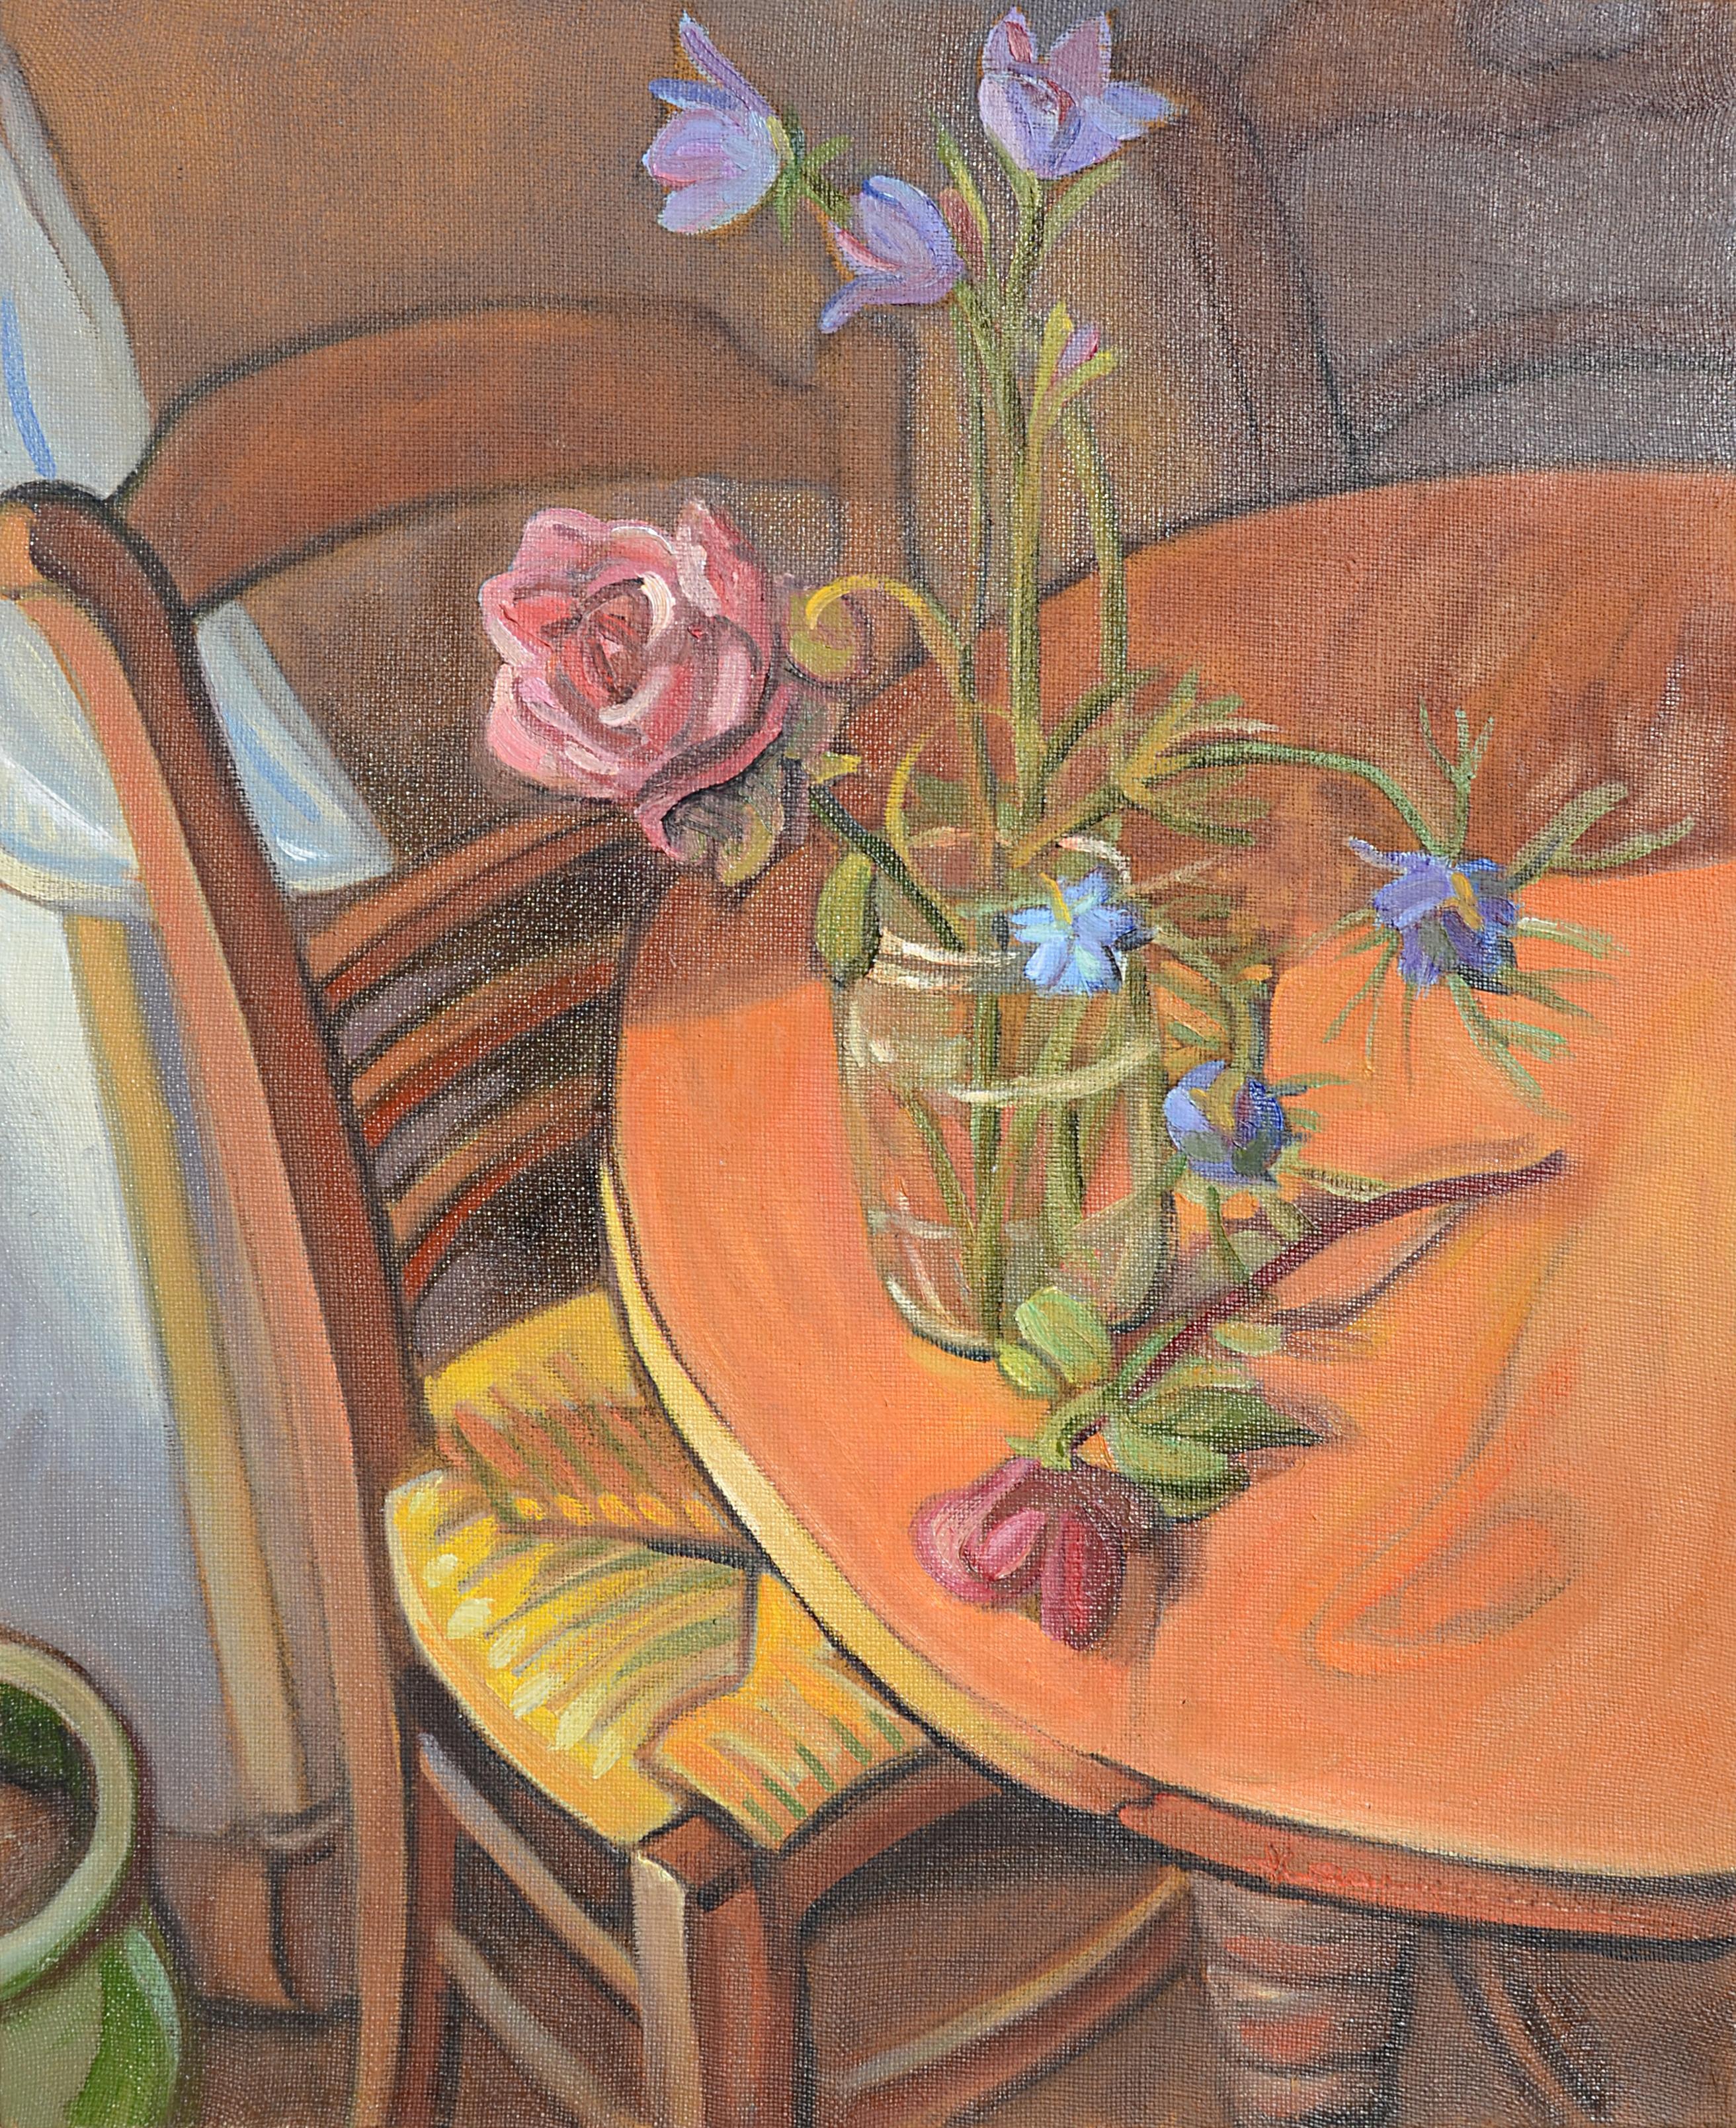 """The Rose Bowl"" (""Le bocal à la rose""), Still Life Interior Oil Painting"